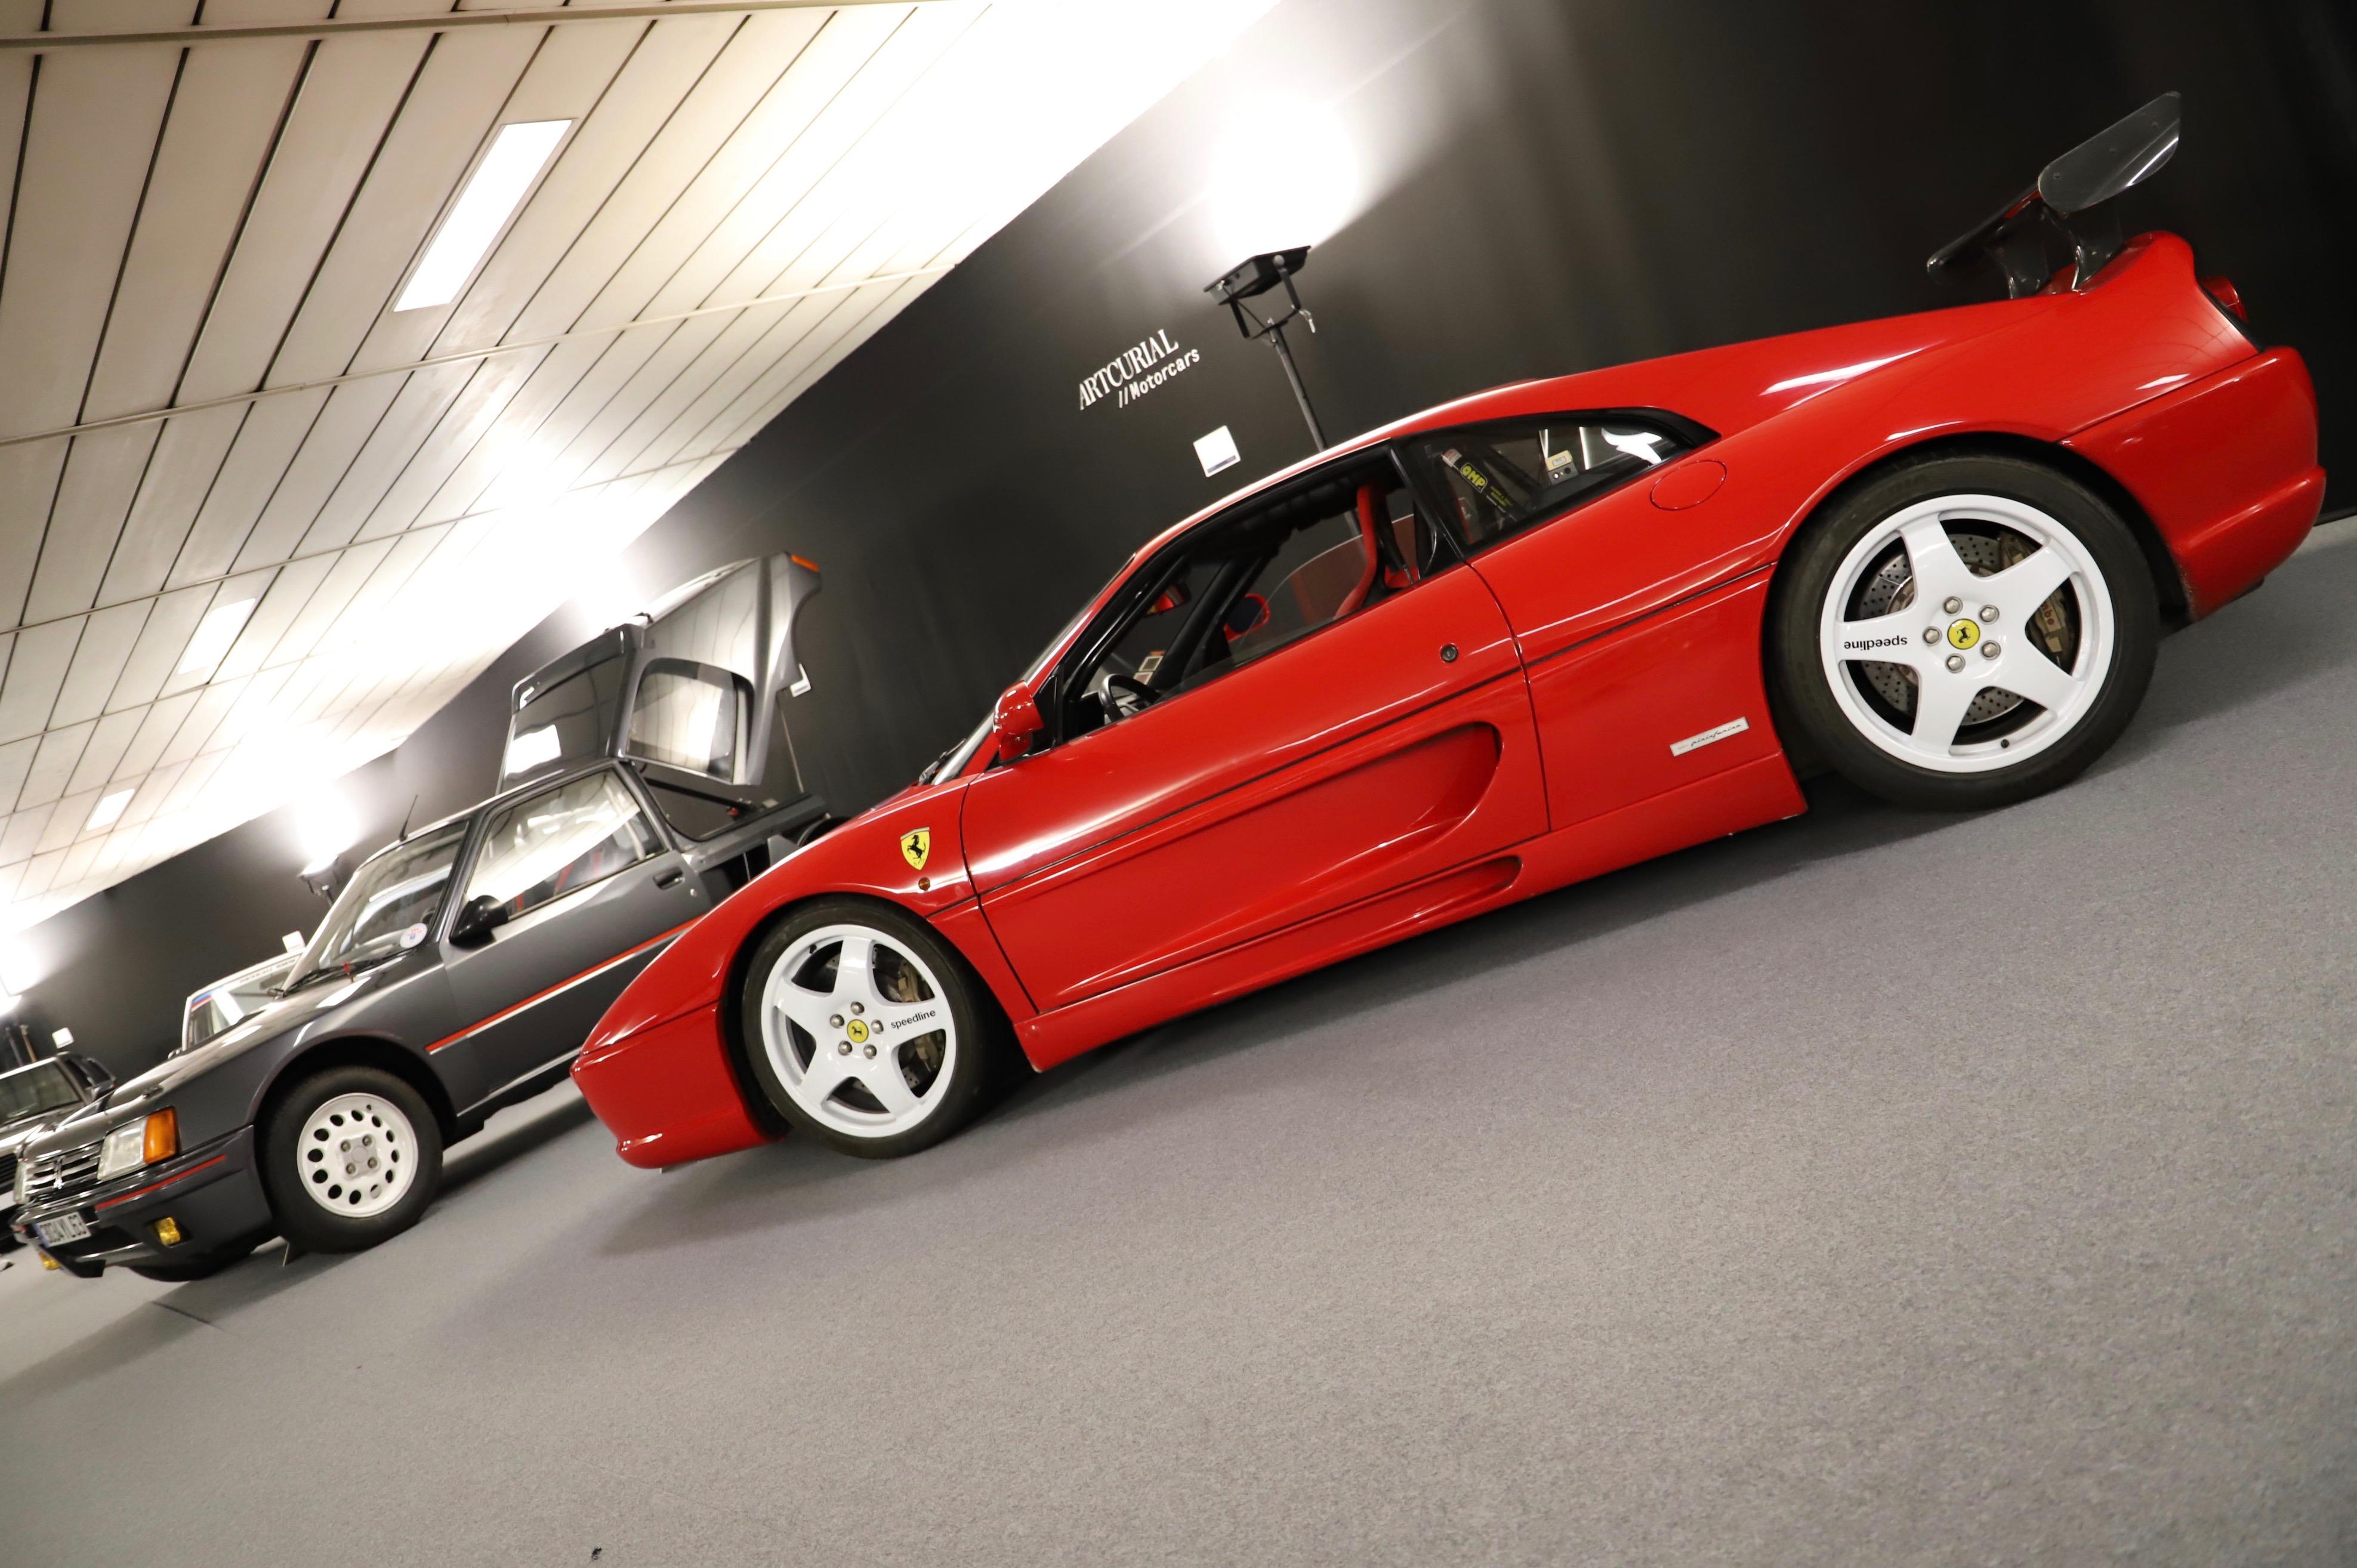 Ferrari 355 Challenge 1995 - La Parisienne 2021 - Motorcars Artcurial - photo Ludo Ferrari